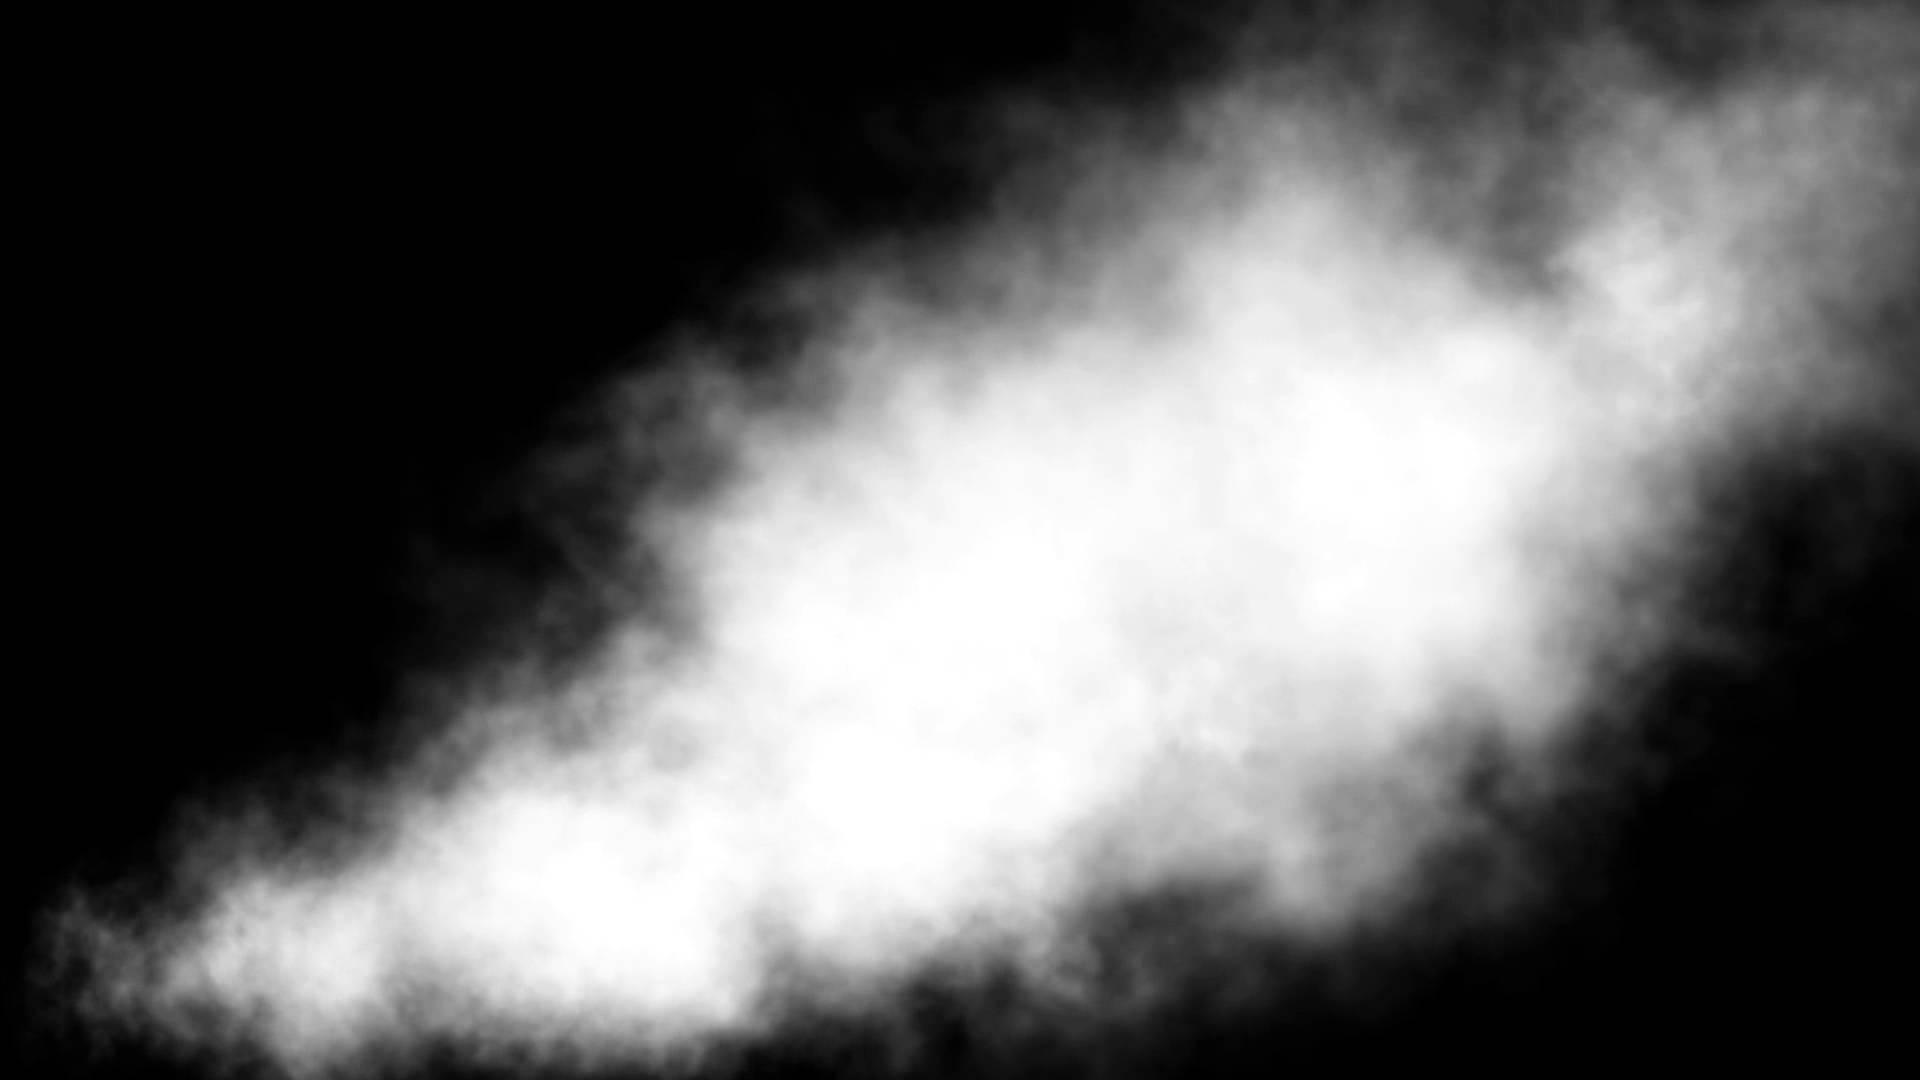 Big White Smoke Wind 2 Black Background ANIMATION FREE FOOTAGE HD ...